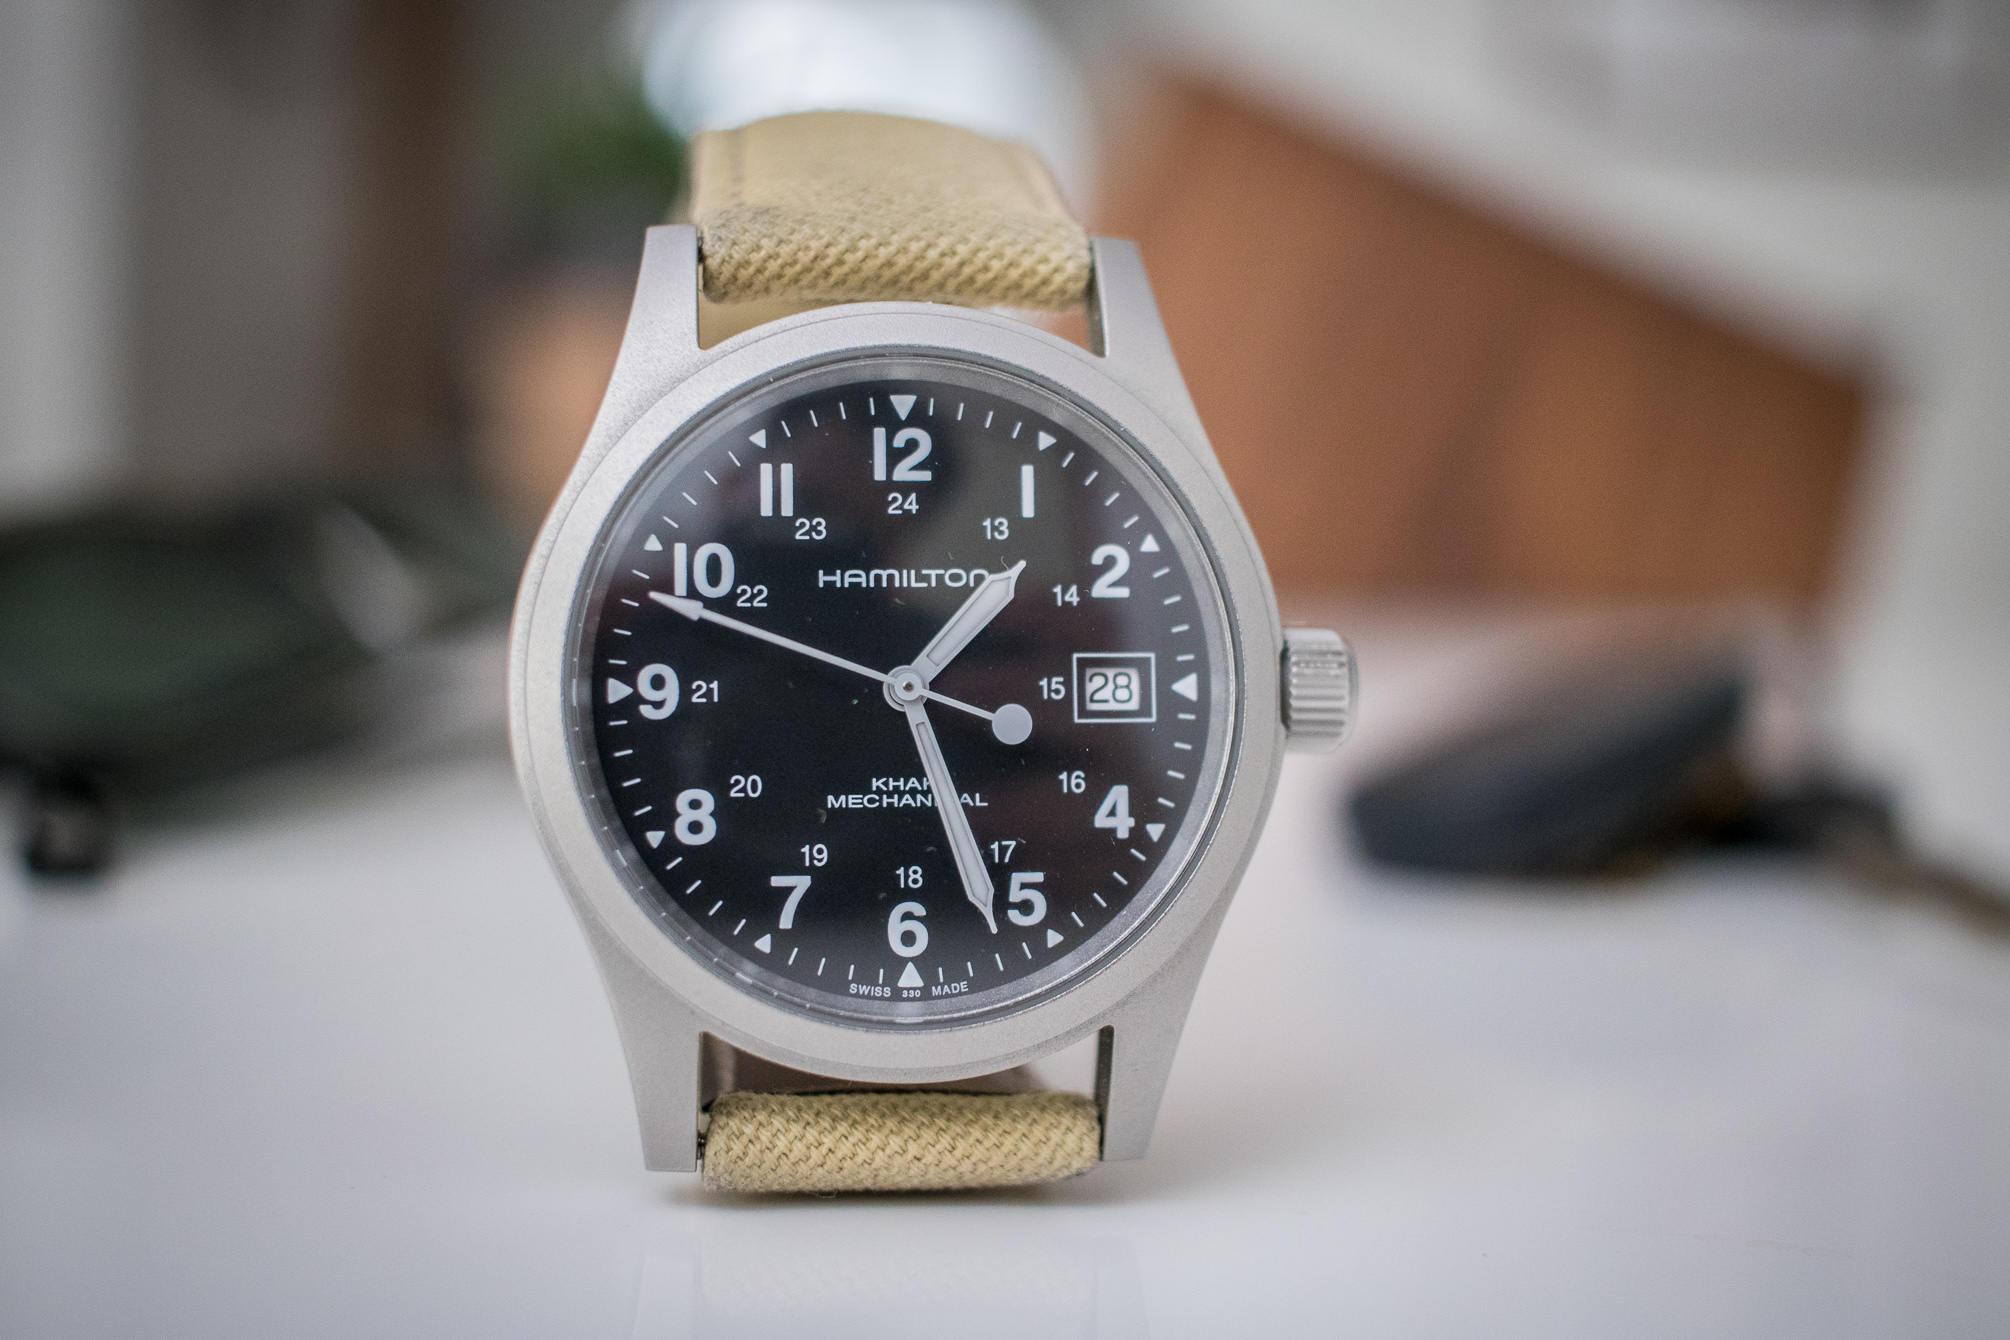 Hamilton Khaki Mechanical Watch Review